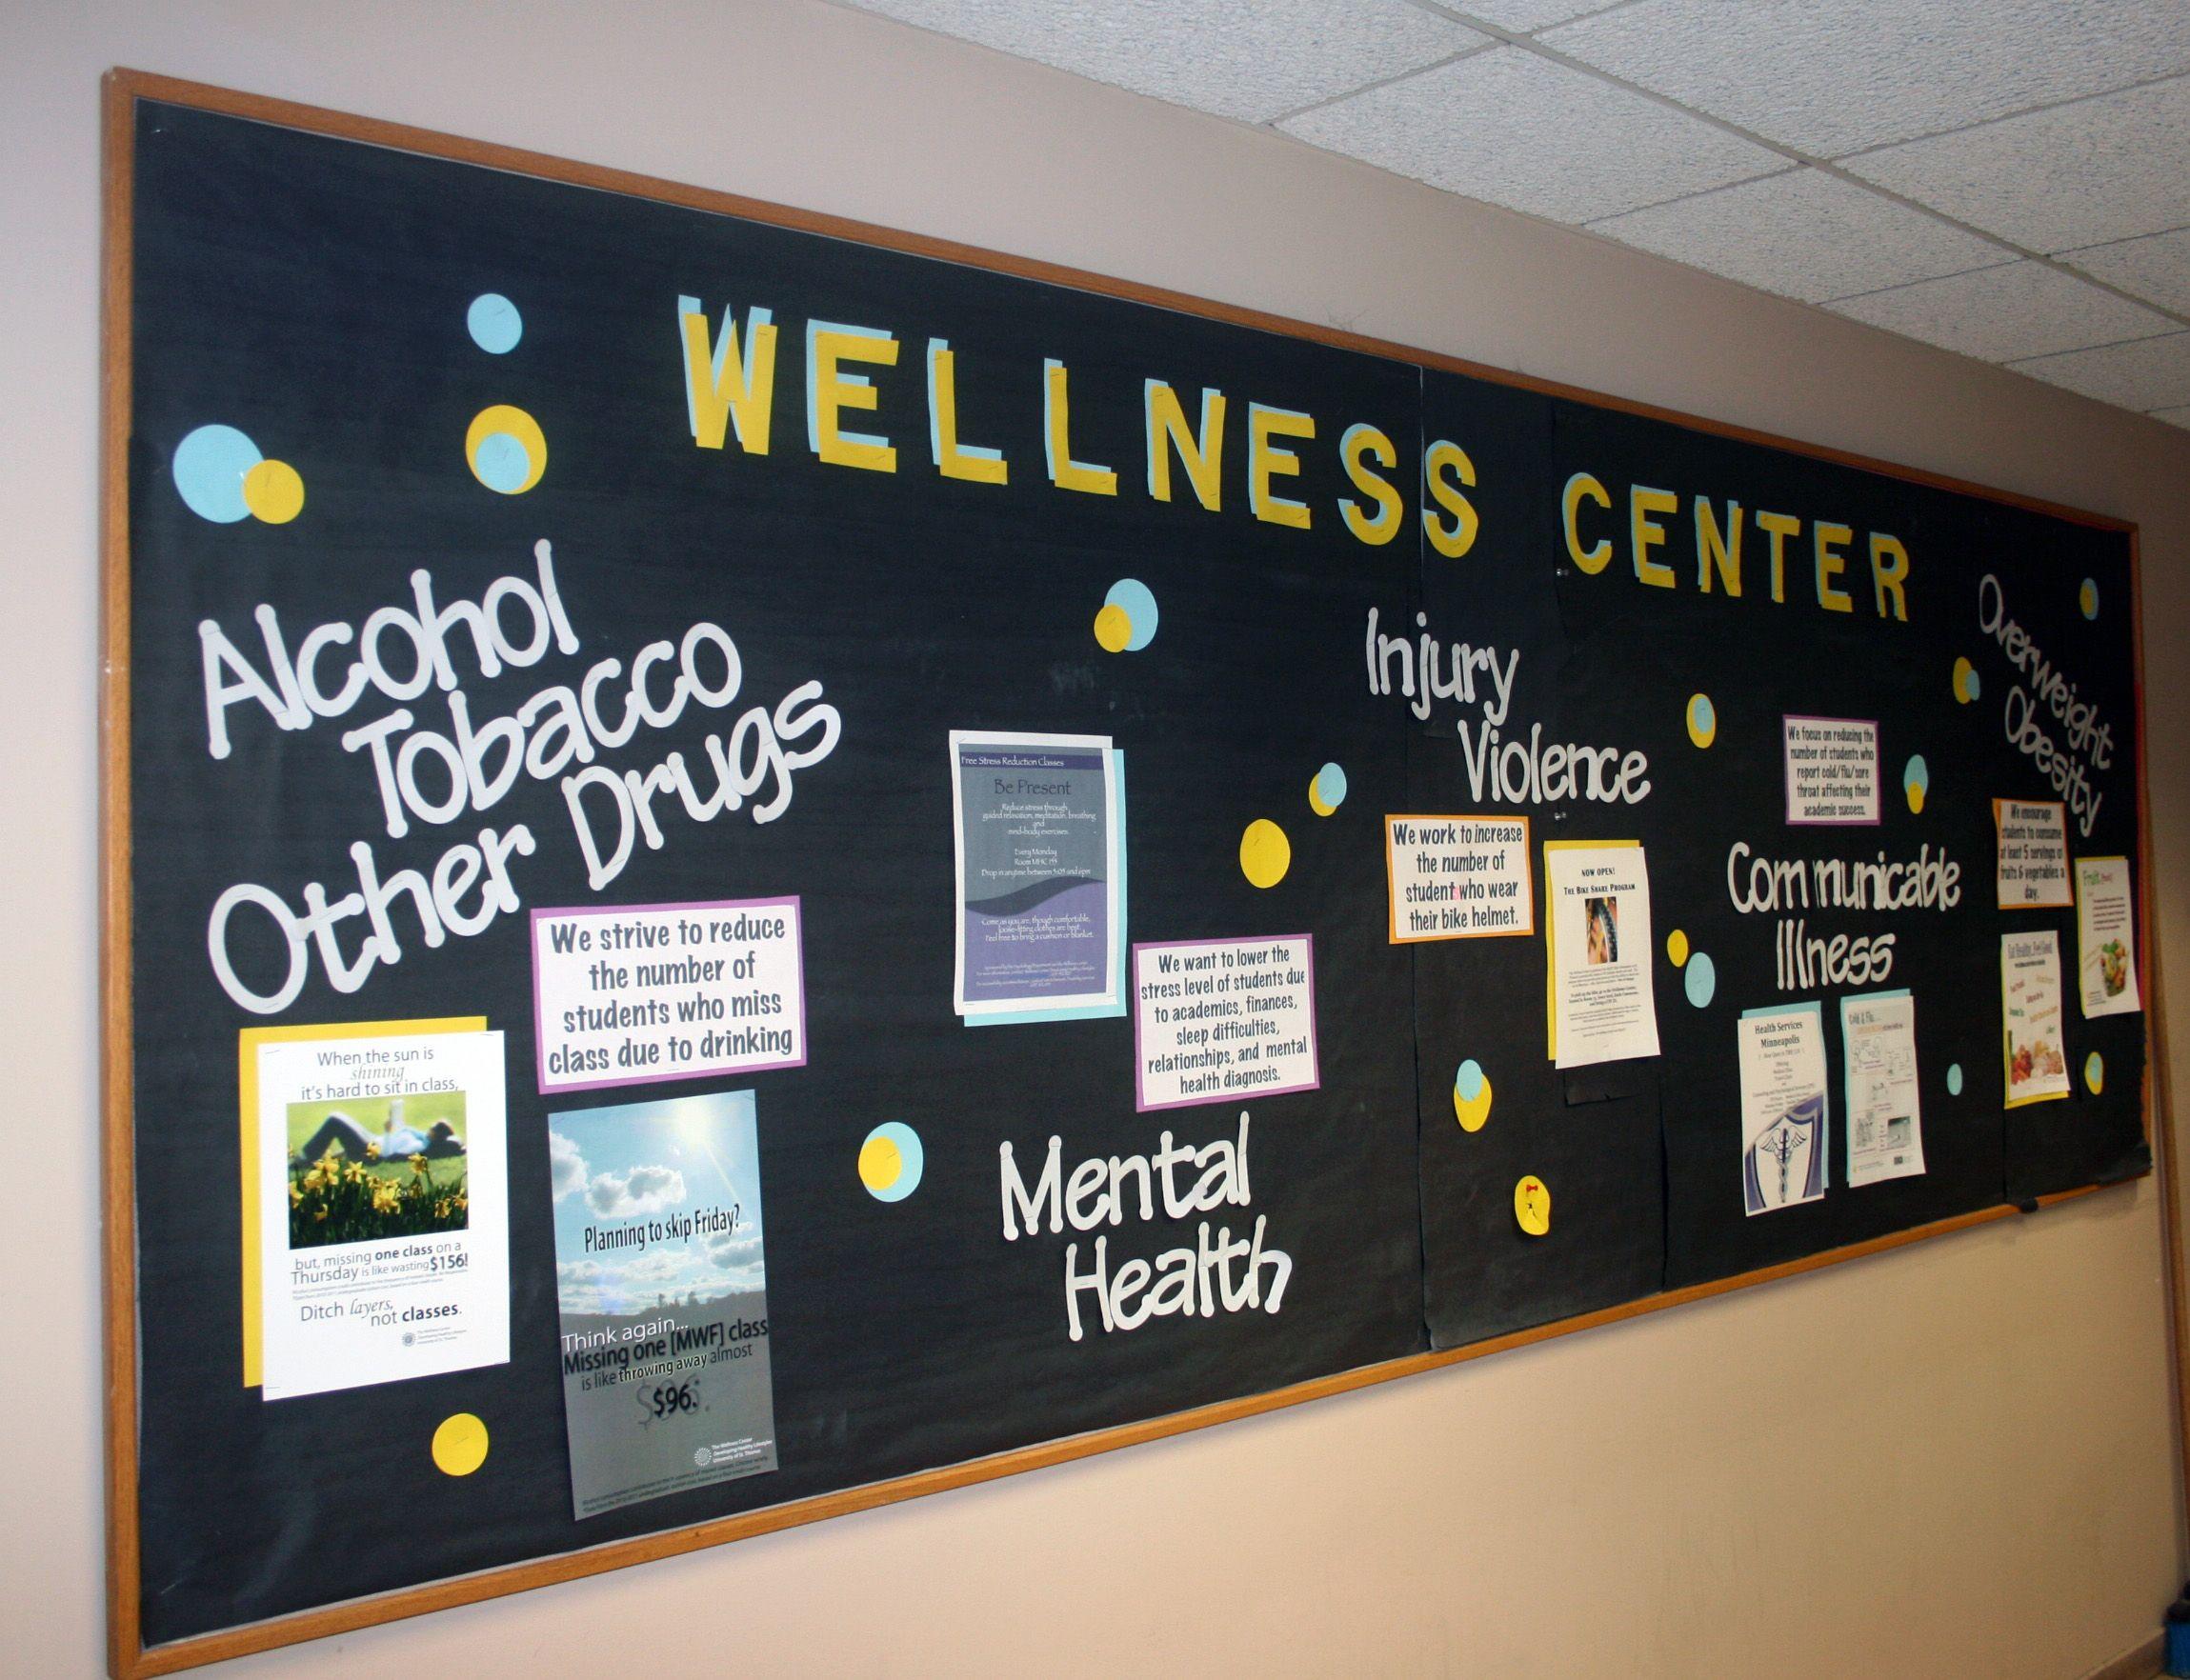 Bacheche Per Ufficio : Wellness center creating councils to improve student health